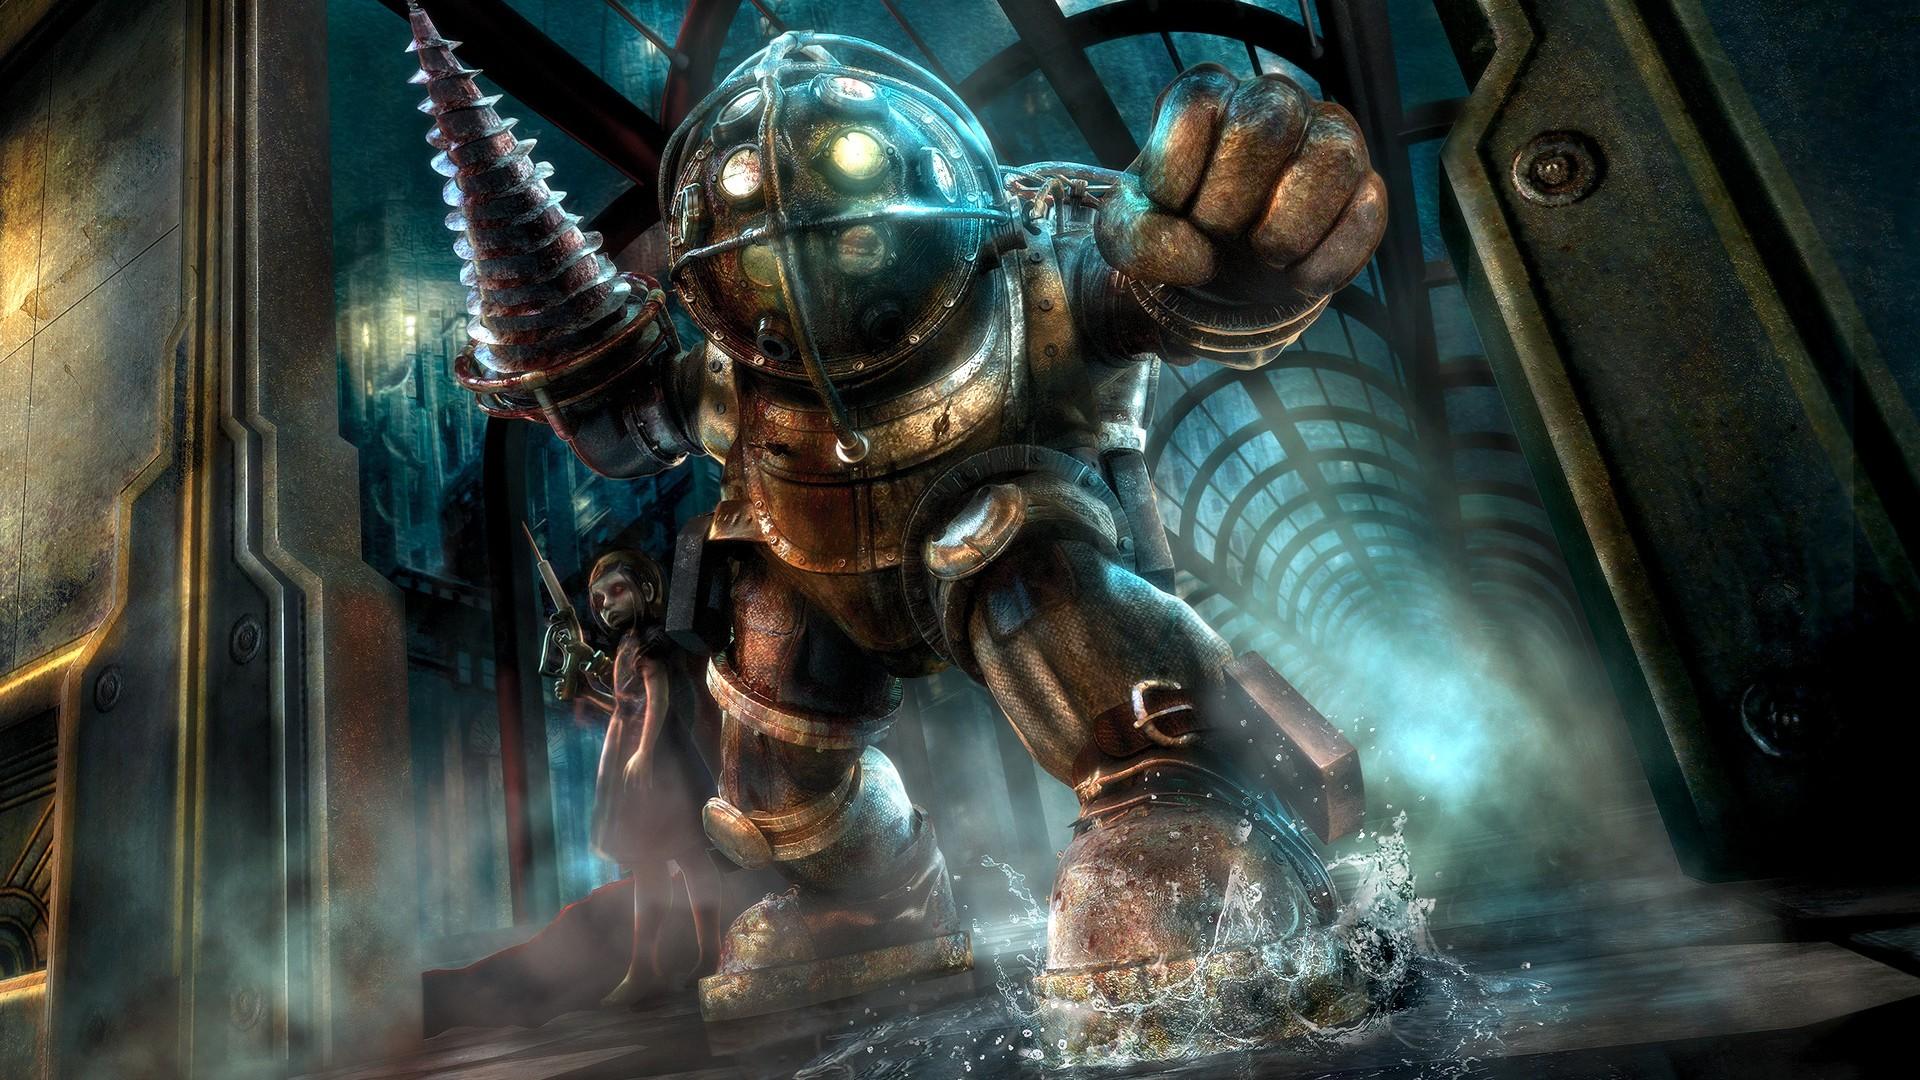 Wallpaper Video Games Sea Big Daddy Bioshock Comics